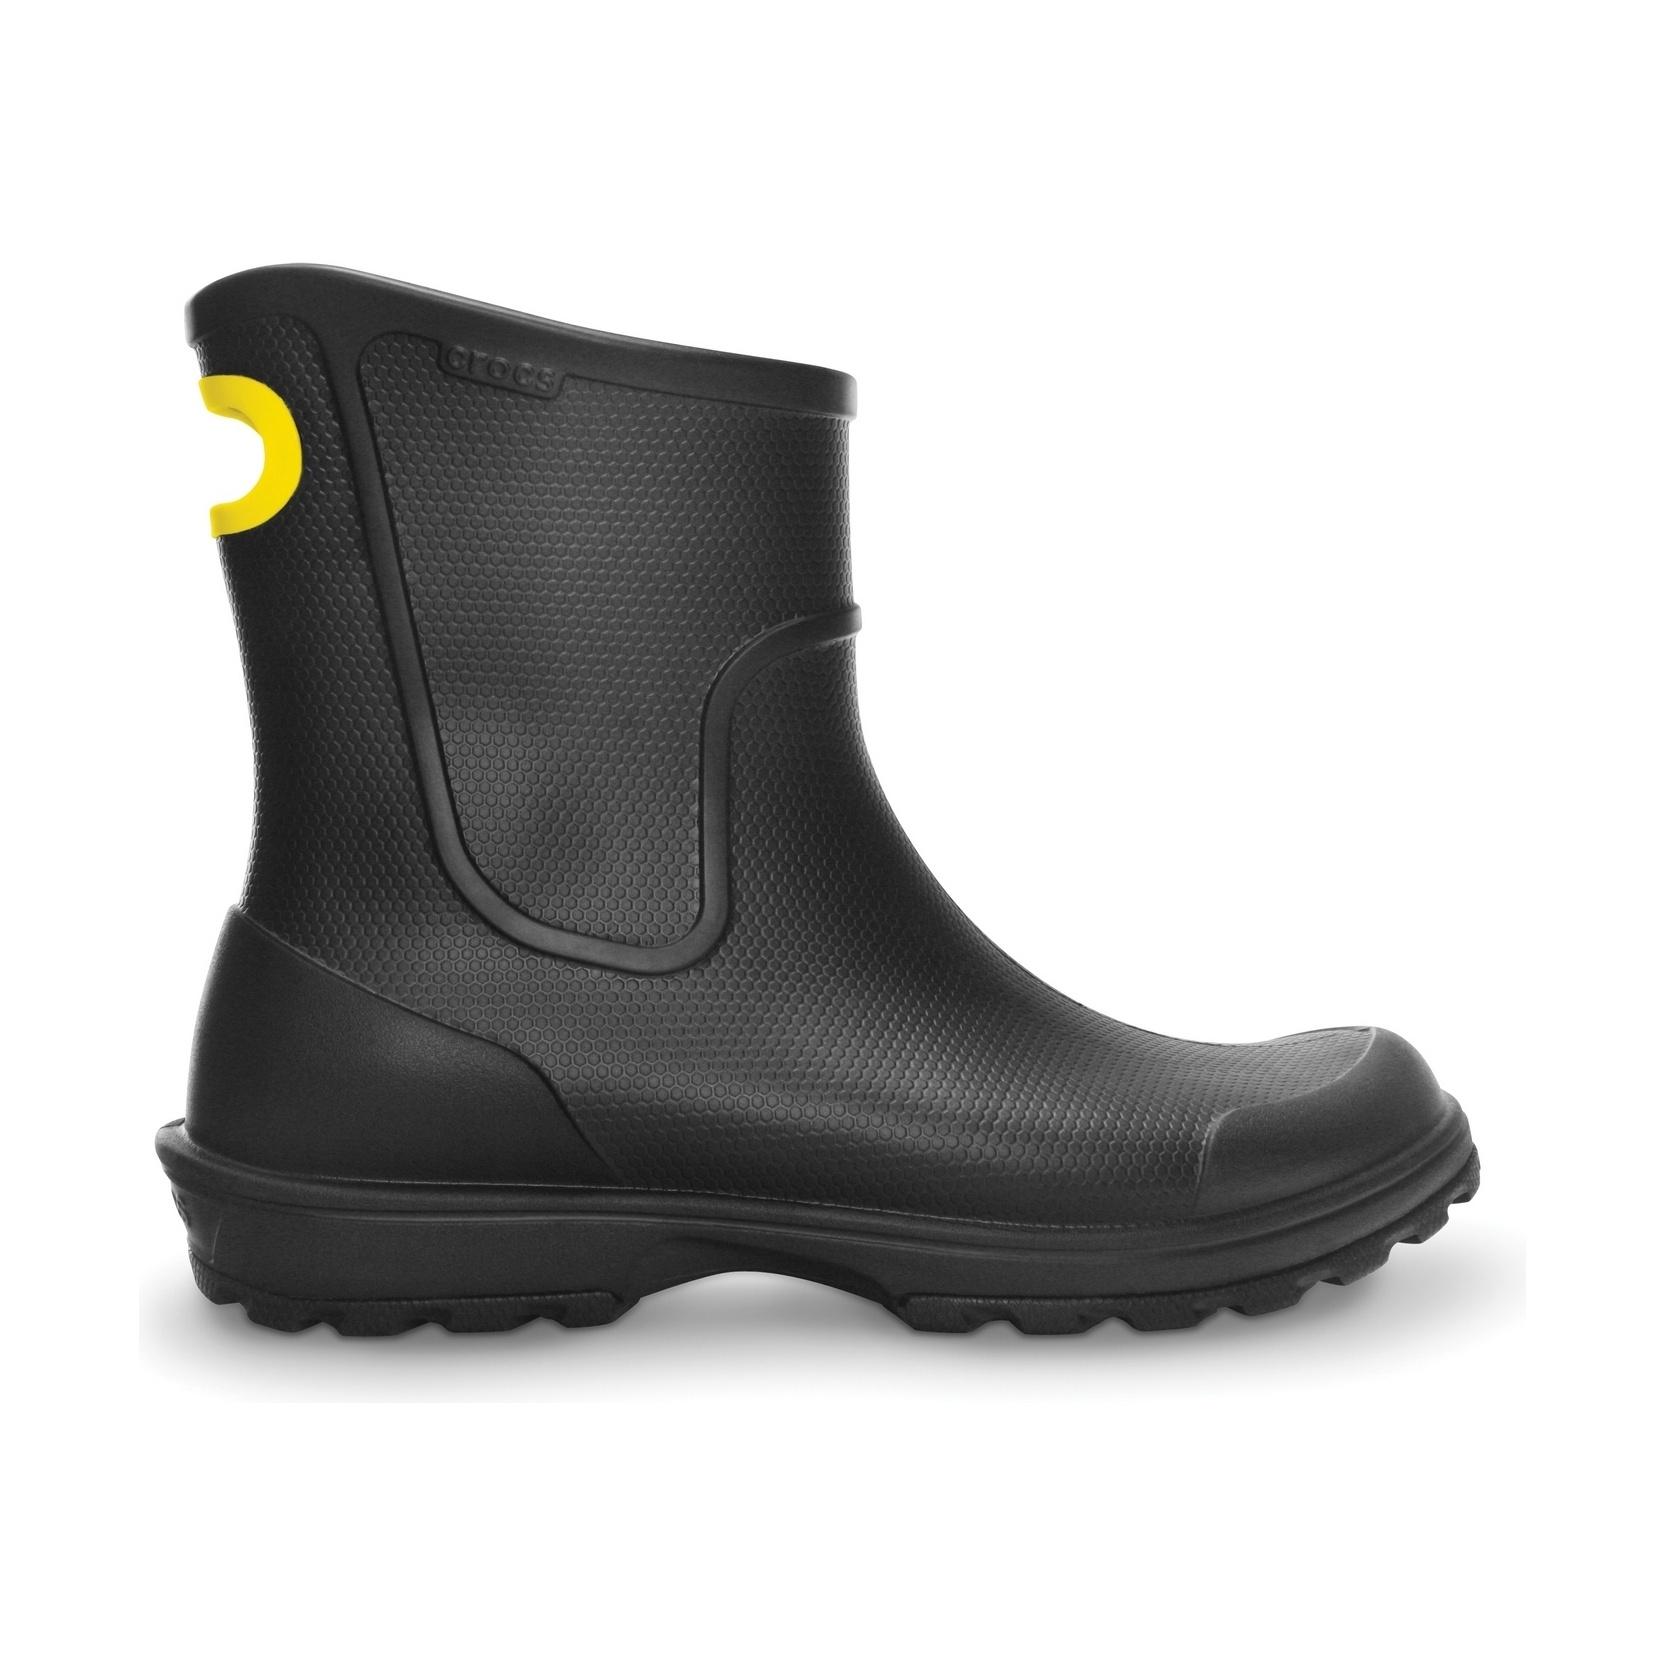 Crocs Mens Wellington Rain Boots | eBay